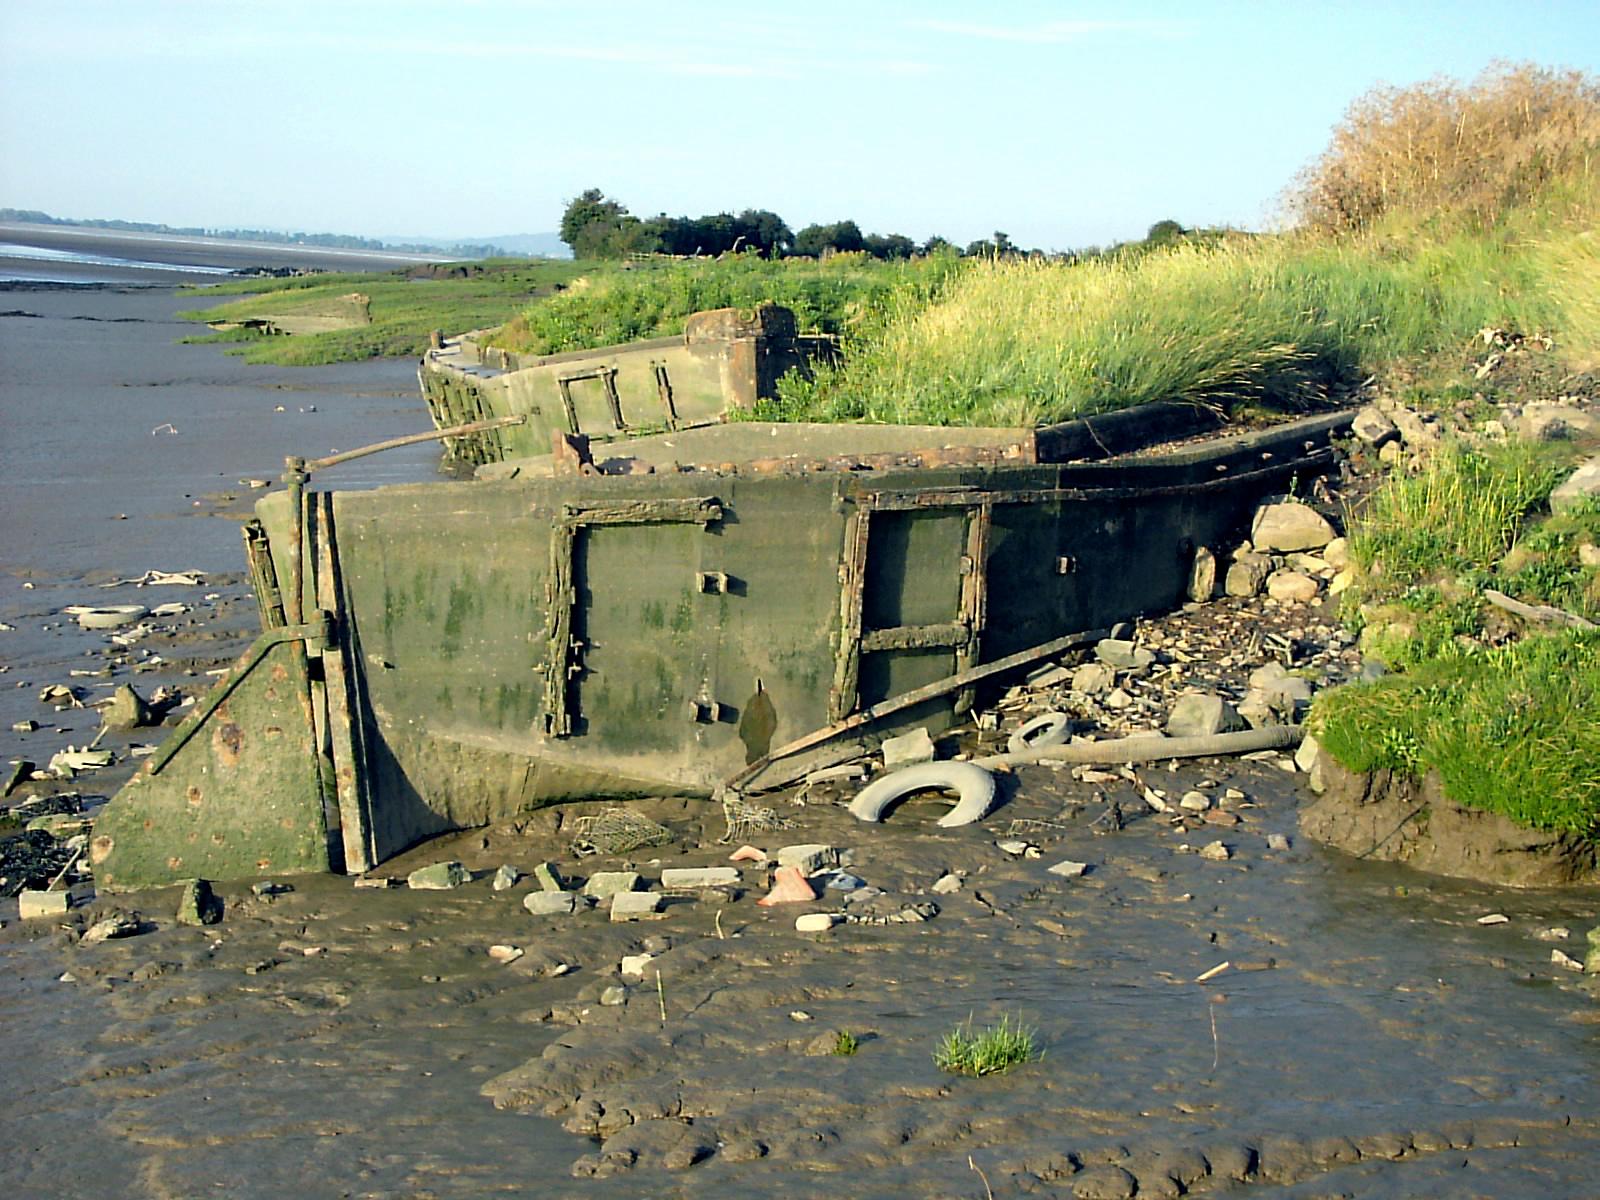 Boat graveyard - geograph.org.uk - 103070